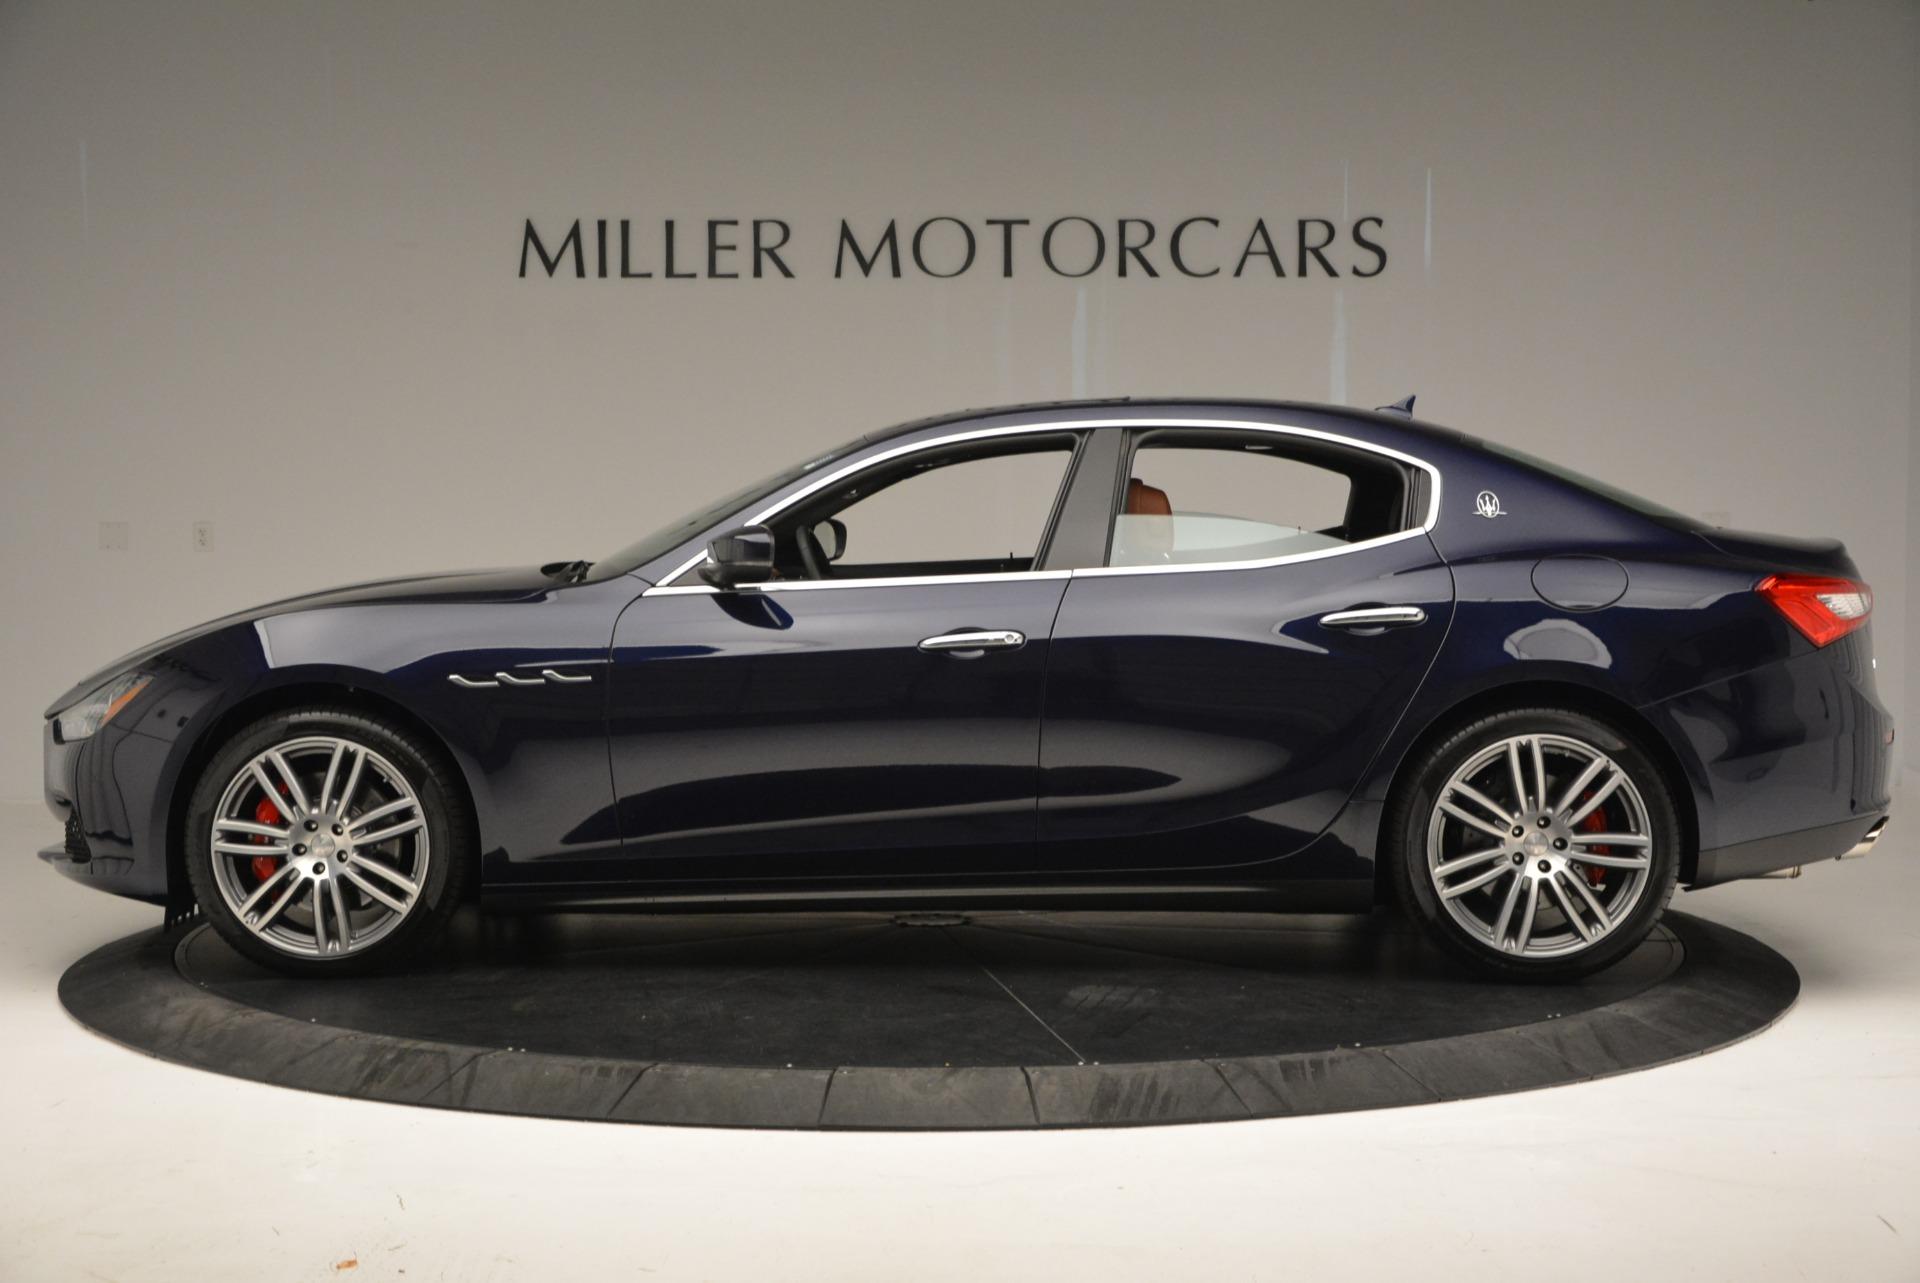 New 2019 Maserati Ghibli S Q4 For Sale In Westport, CT 2606_p3